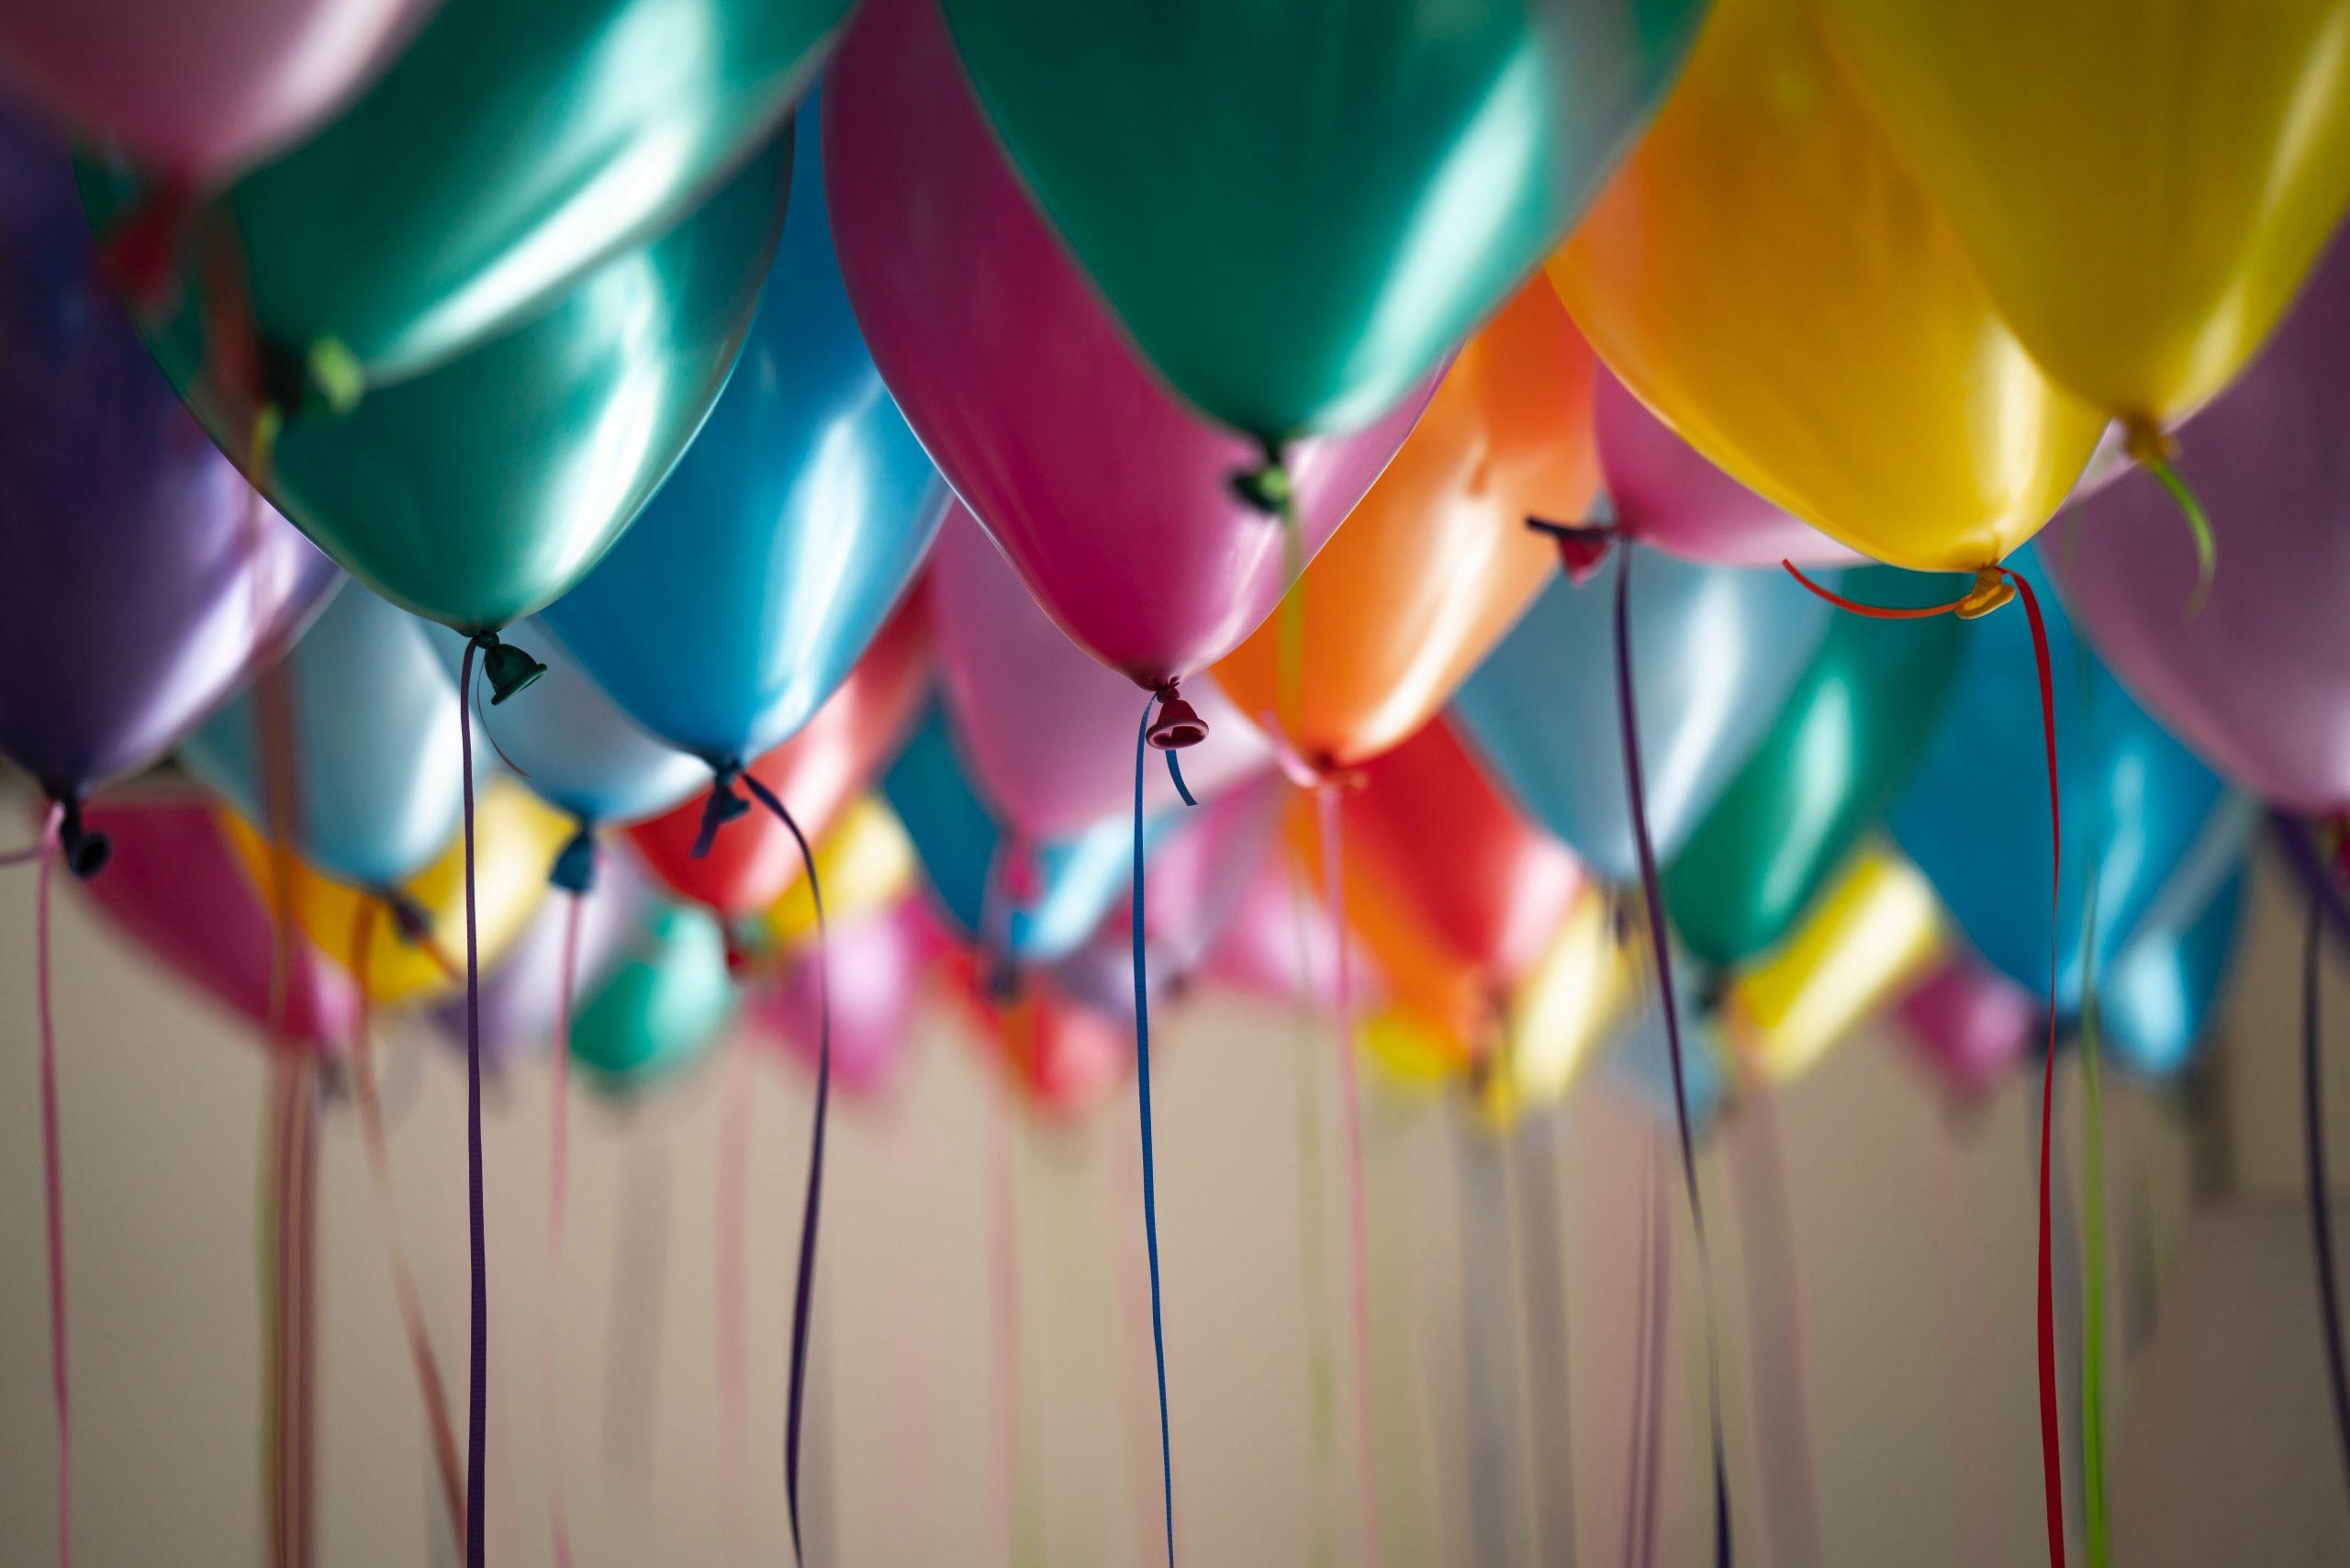 Drive Thru Birthday Party for Jesus